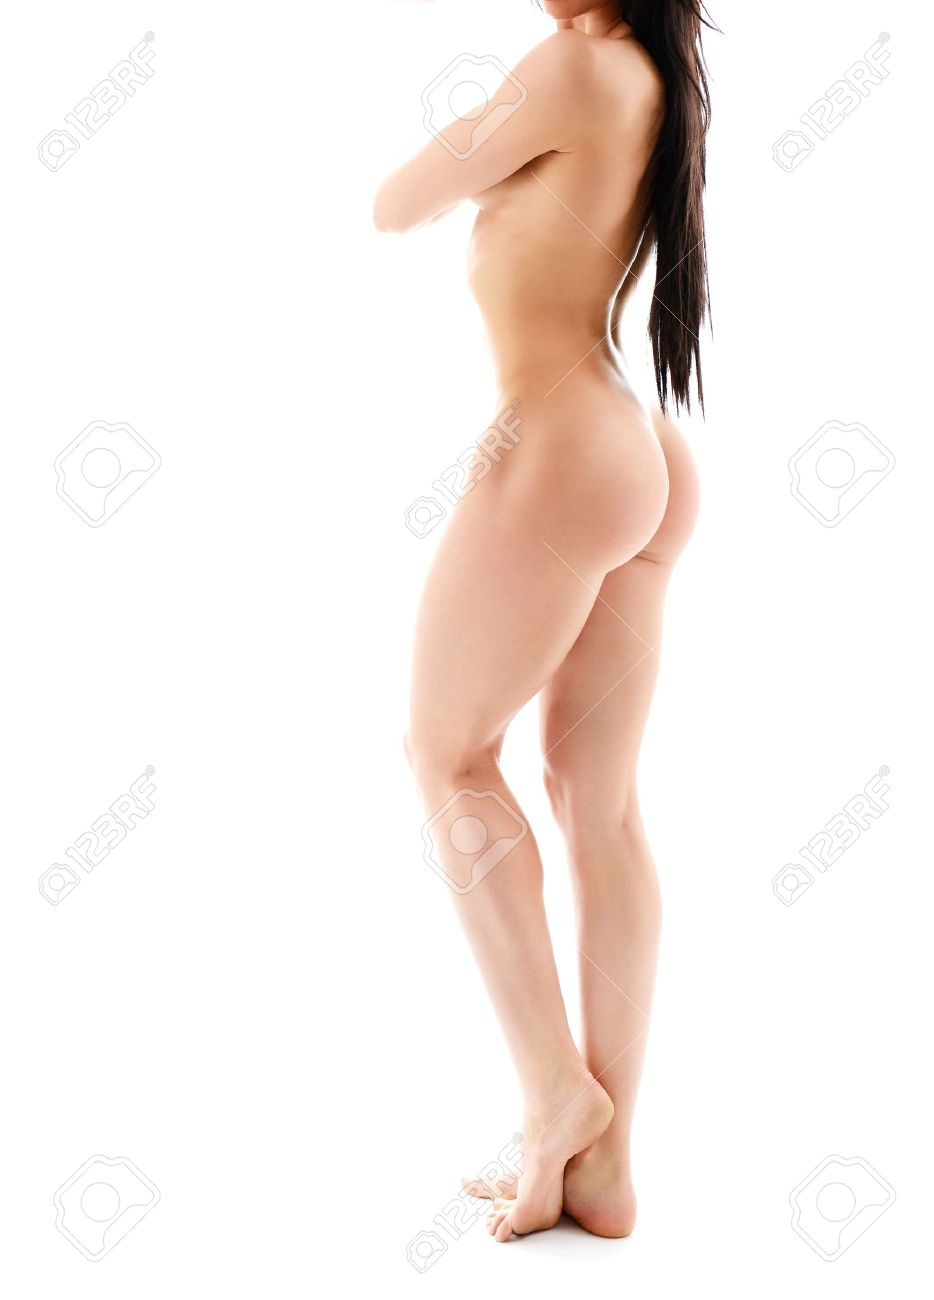 Fitness Girl Nude Black